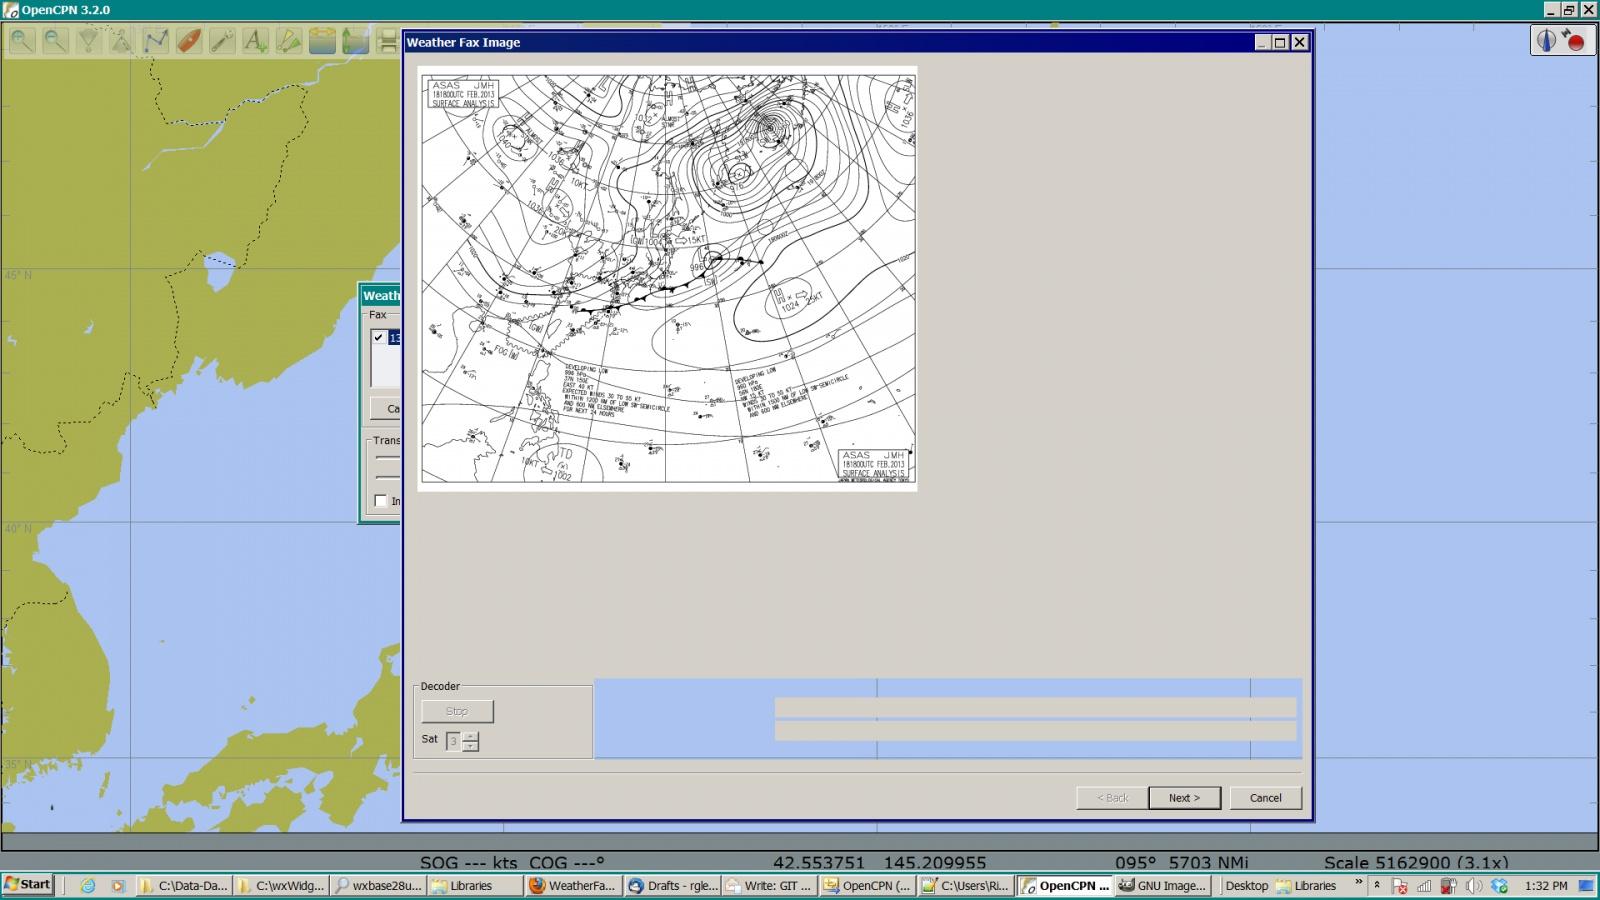 Click image for larger version  Name:WxFx-Edit-Transparent-Stil-at-Bottom.jpg Views:76 Size:308.2 KB ID:57339